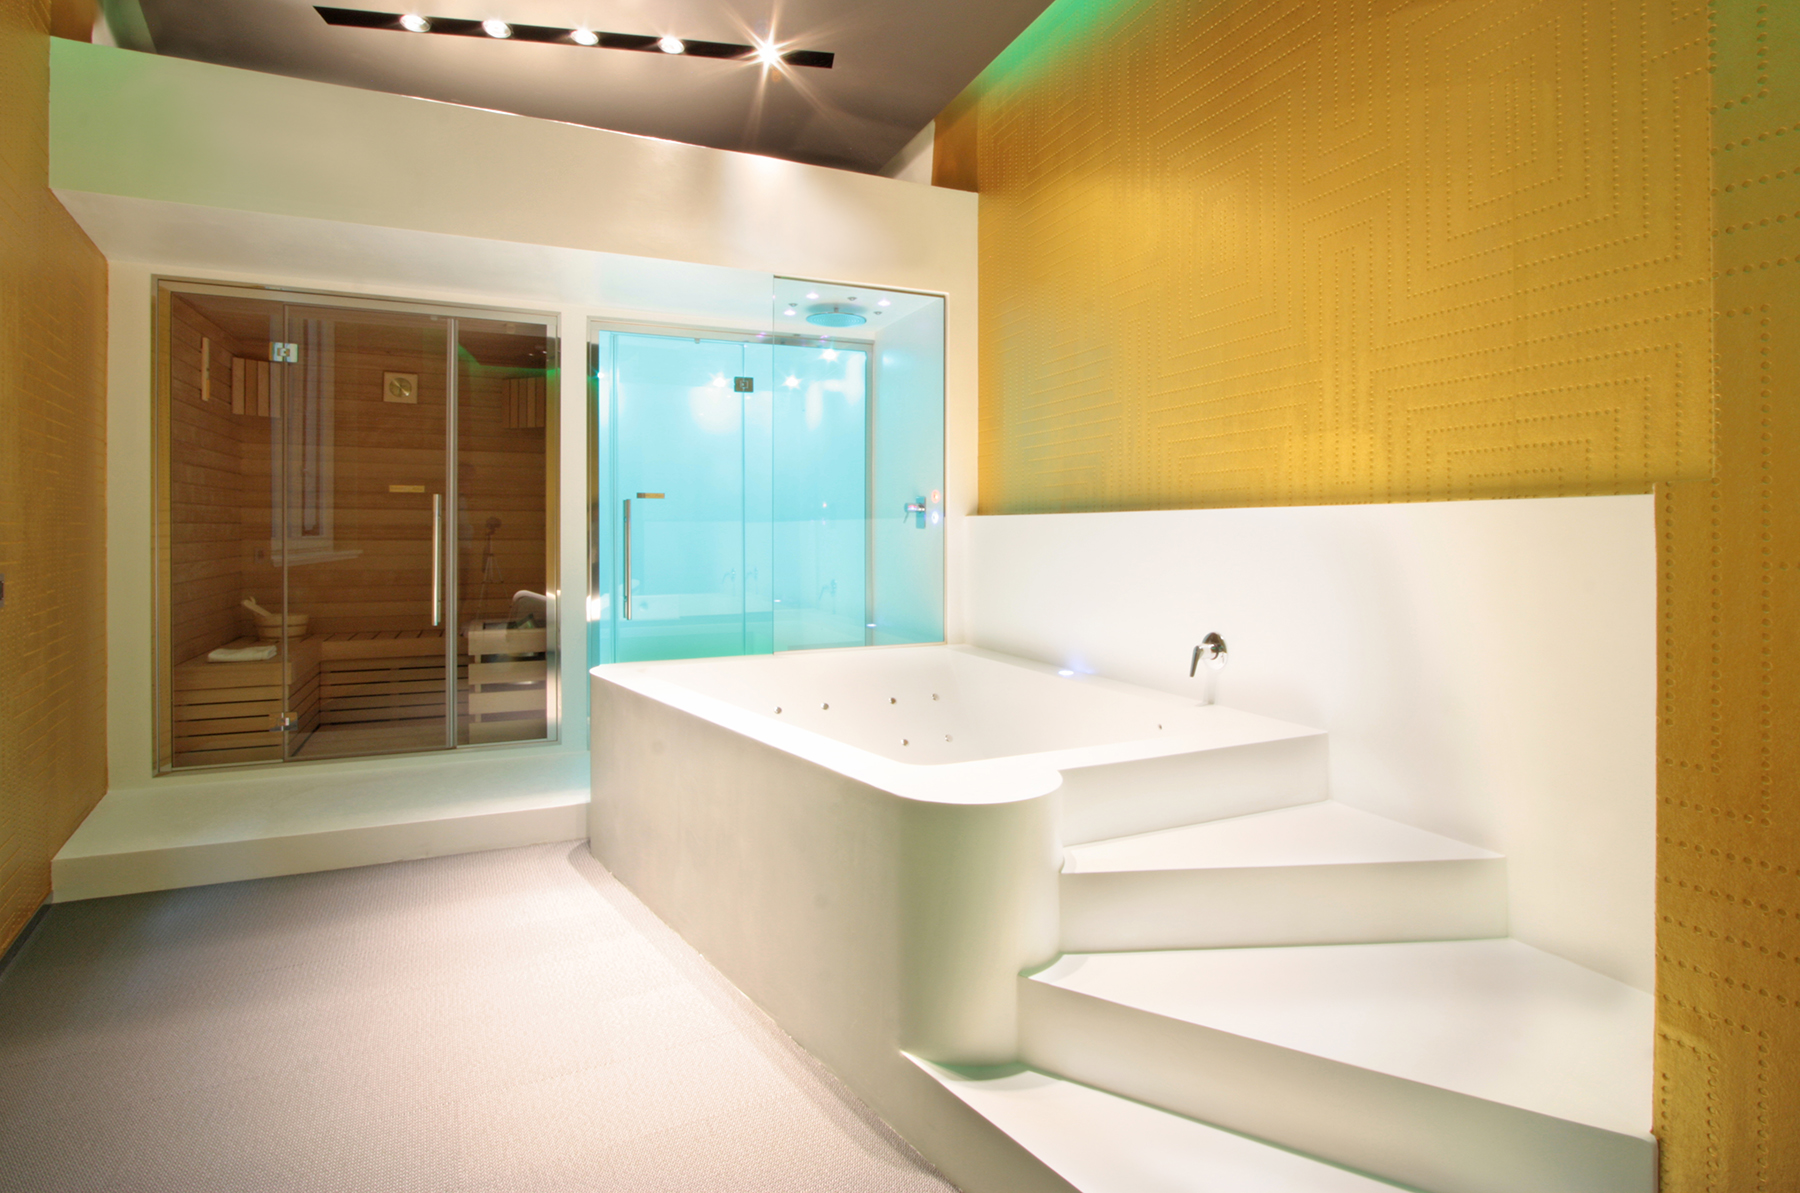 Hotel Spadai_Spa suite bagno turco vasca idro coppia sauna